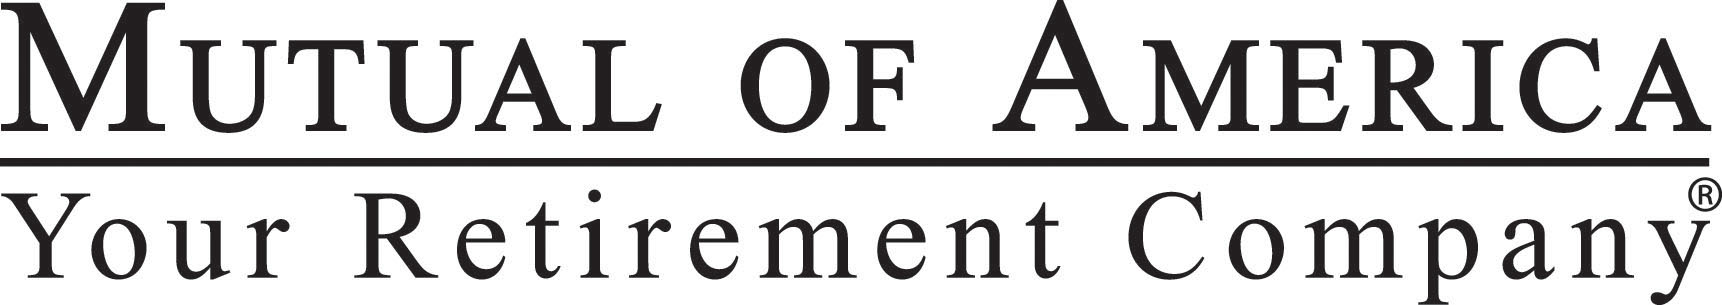 Mutual of America logo